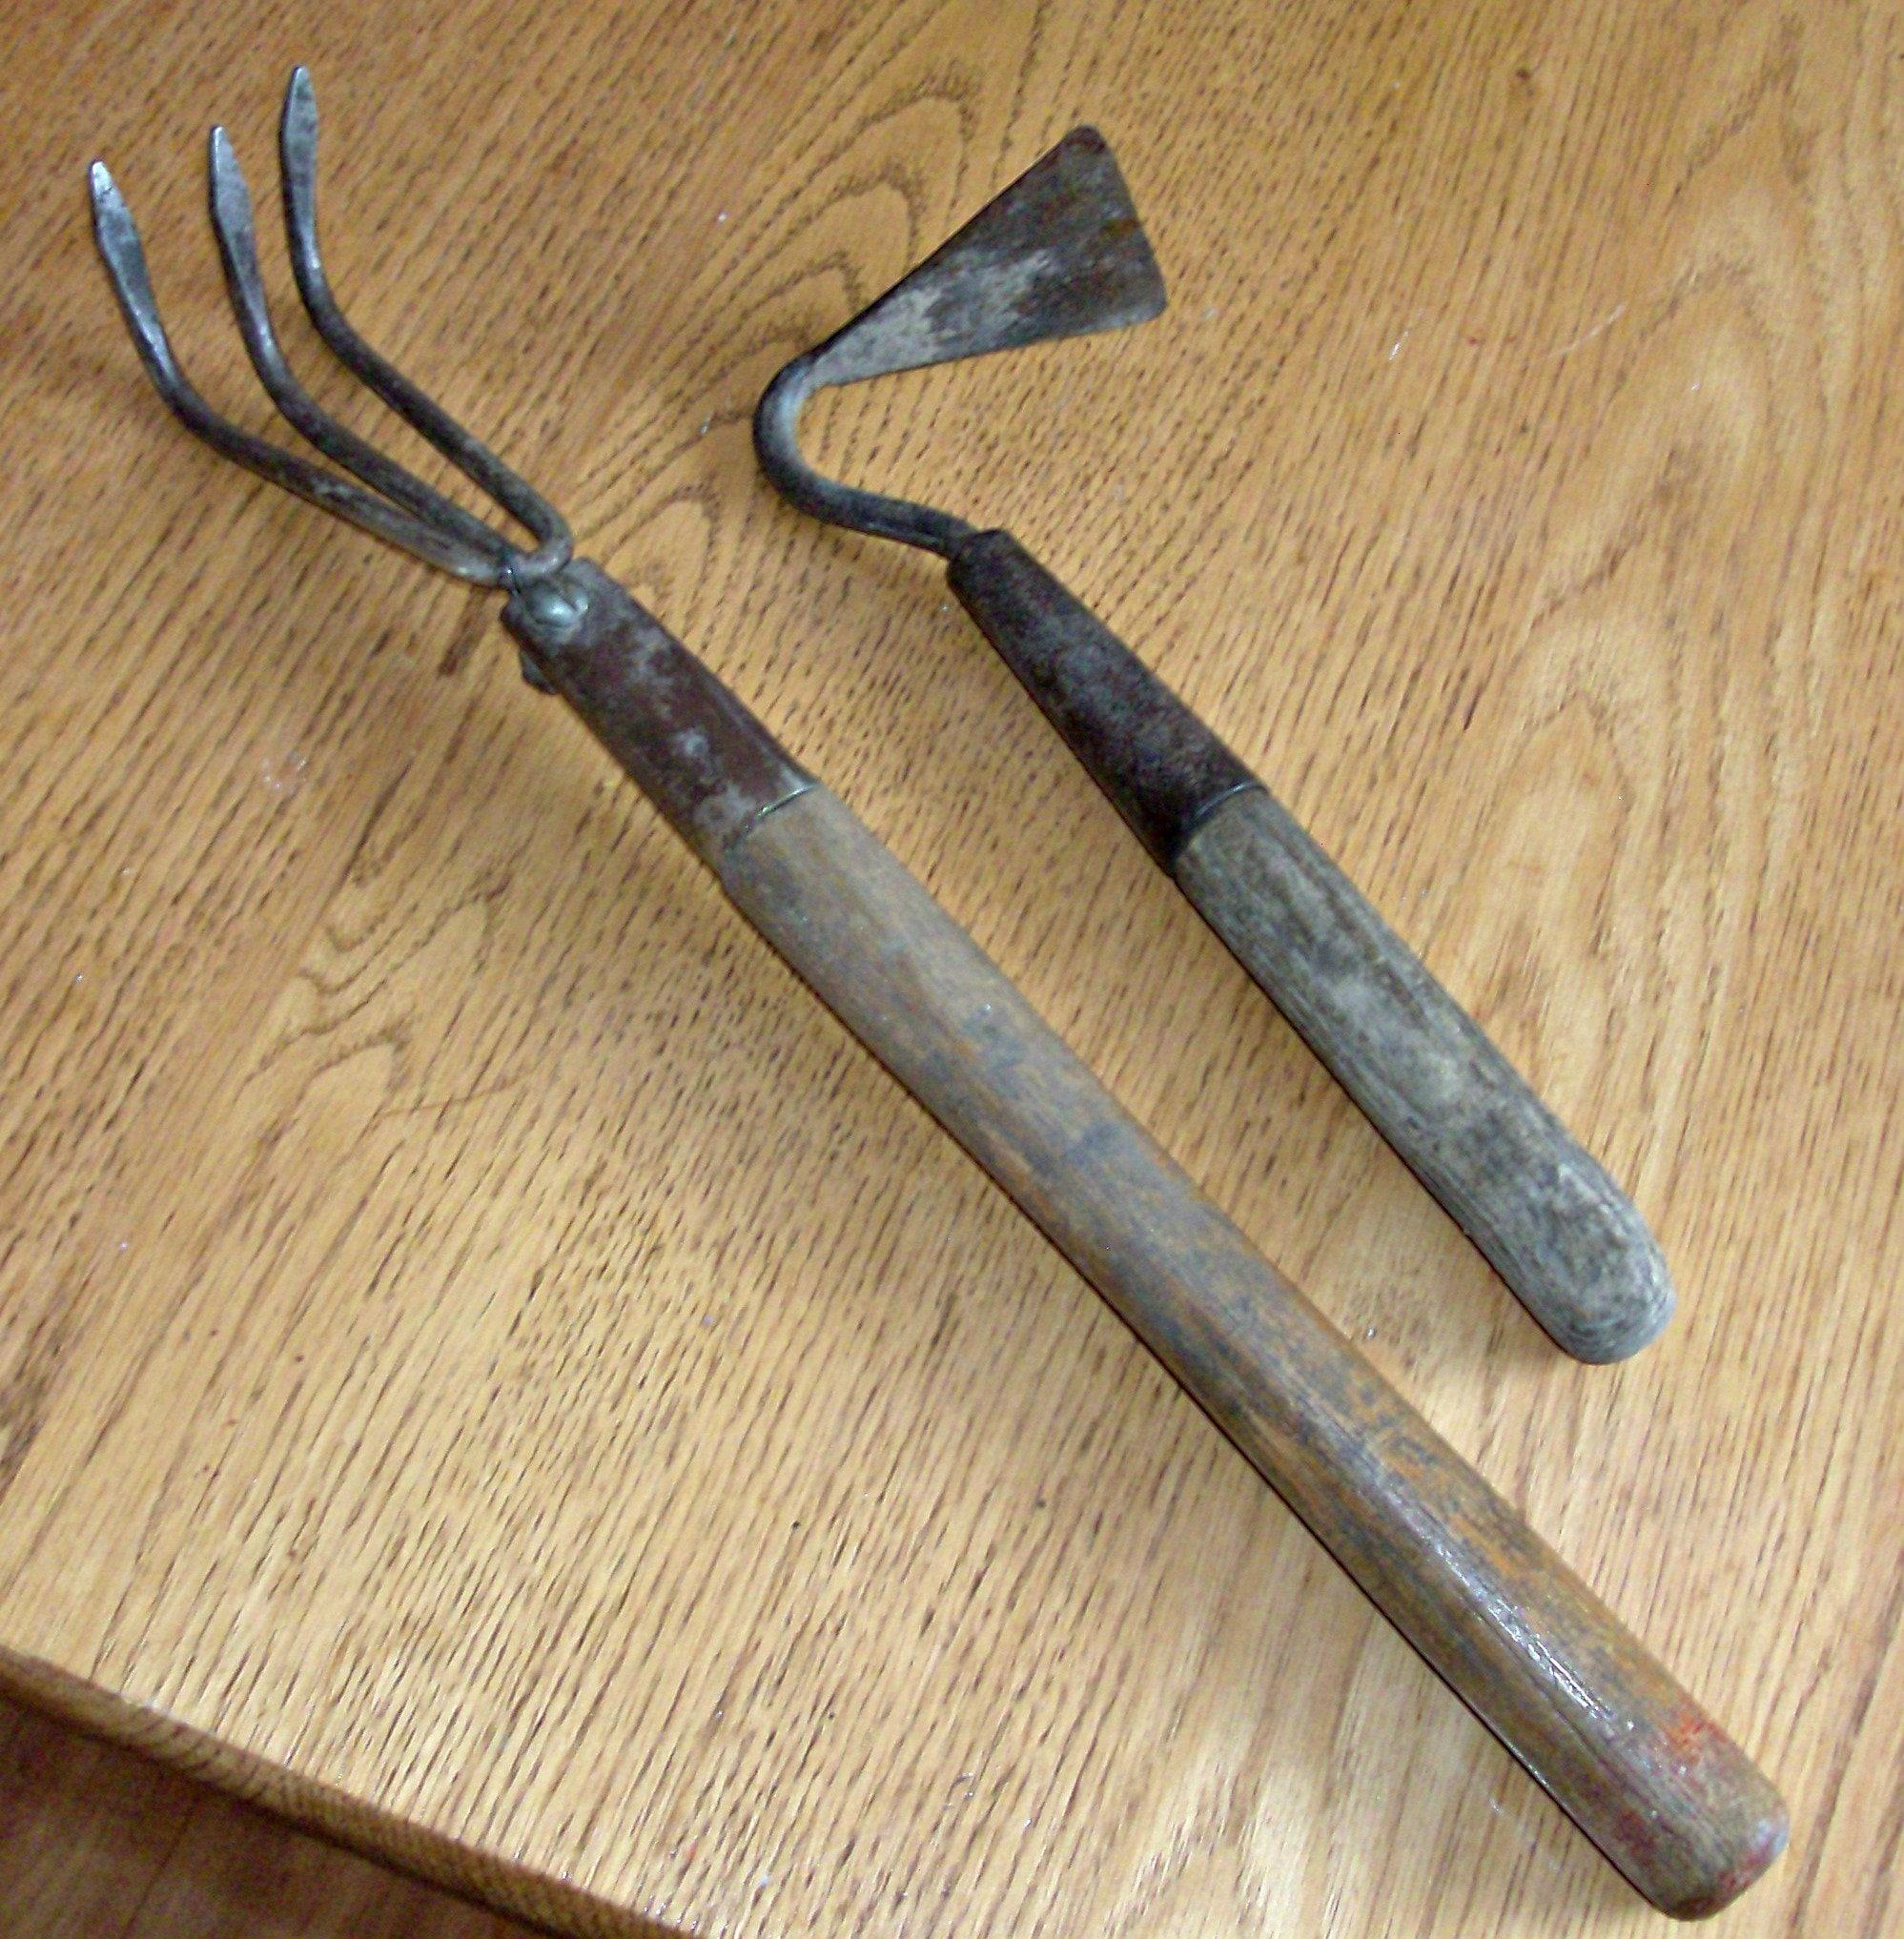 Lot of 2 Vintage Wood Handle Garden Tools